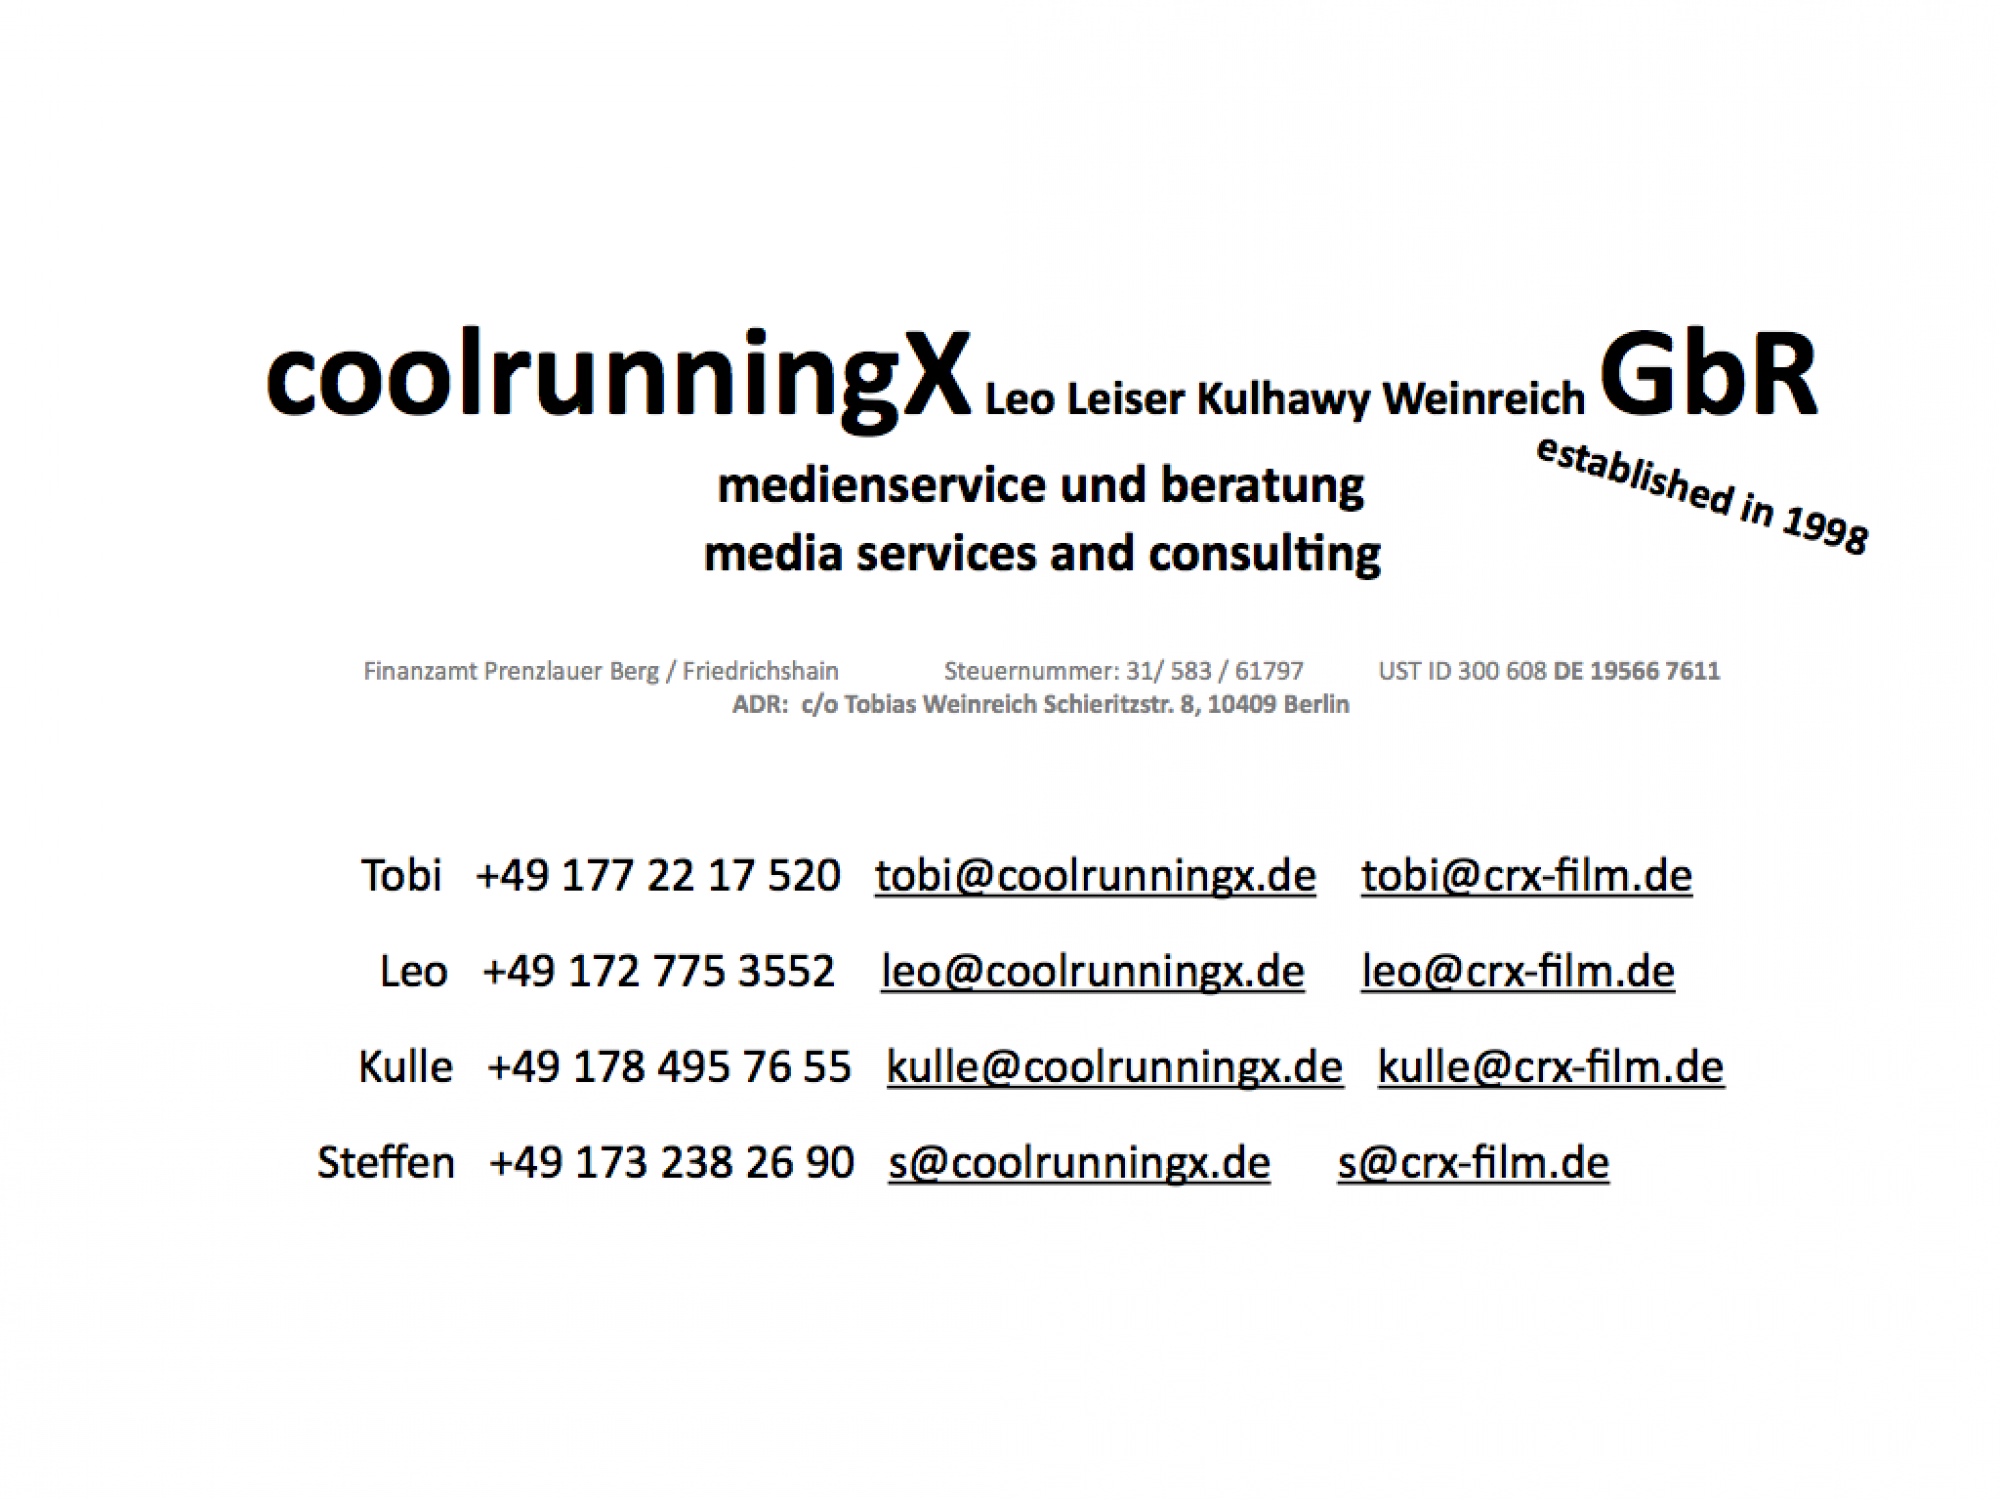 coolrunningx GBR